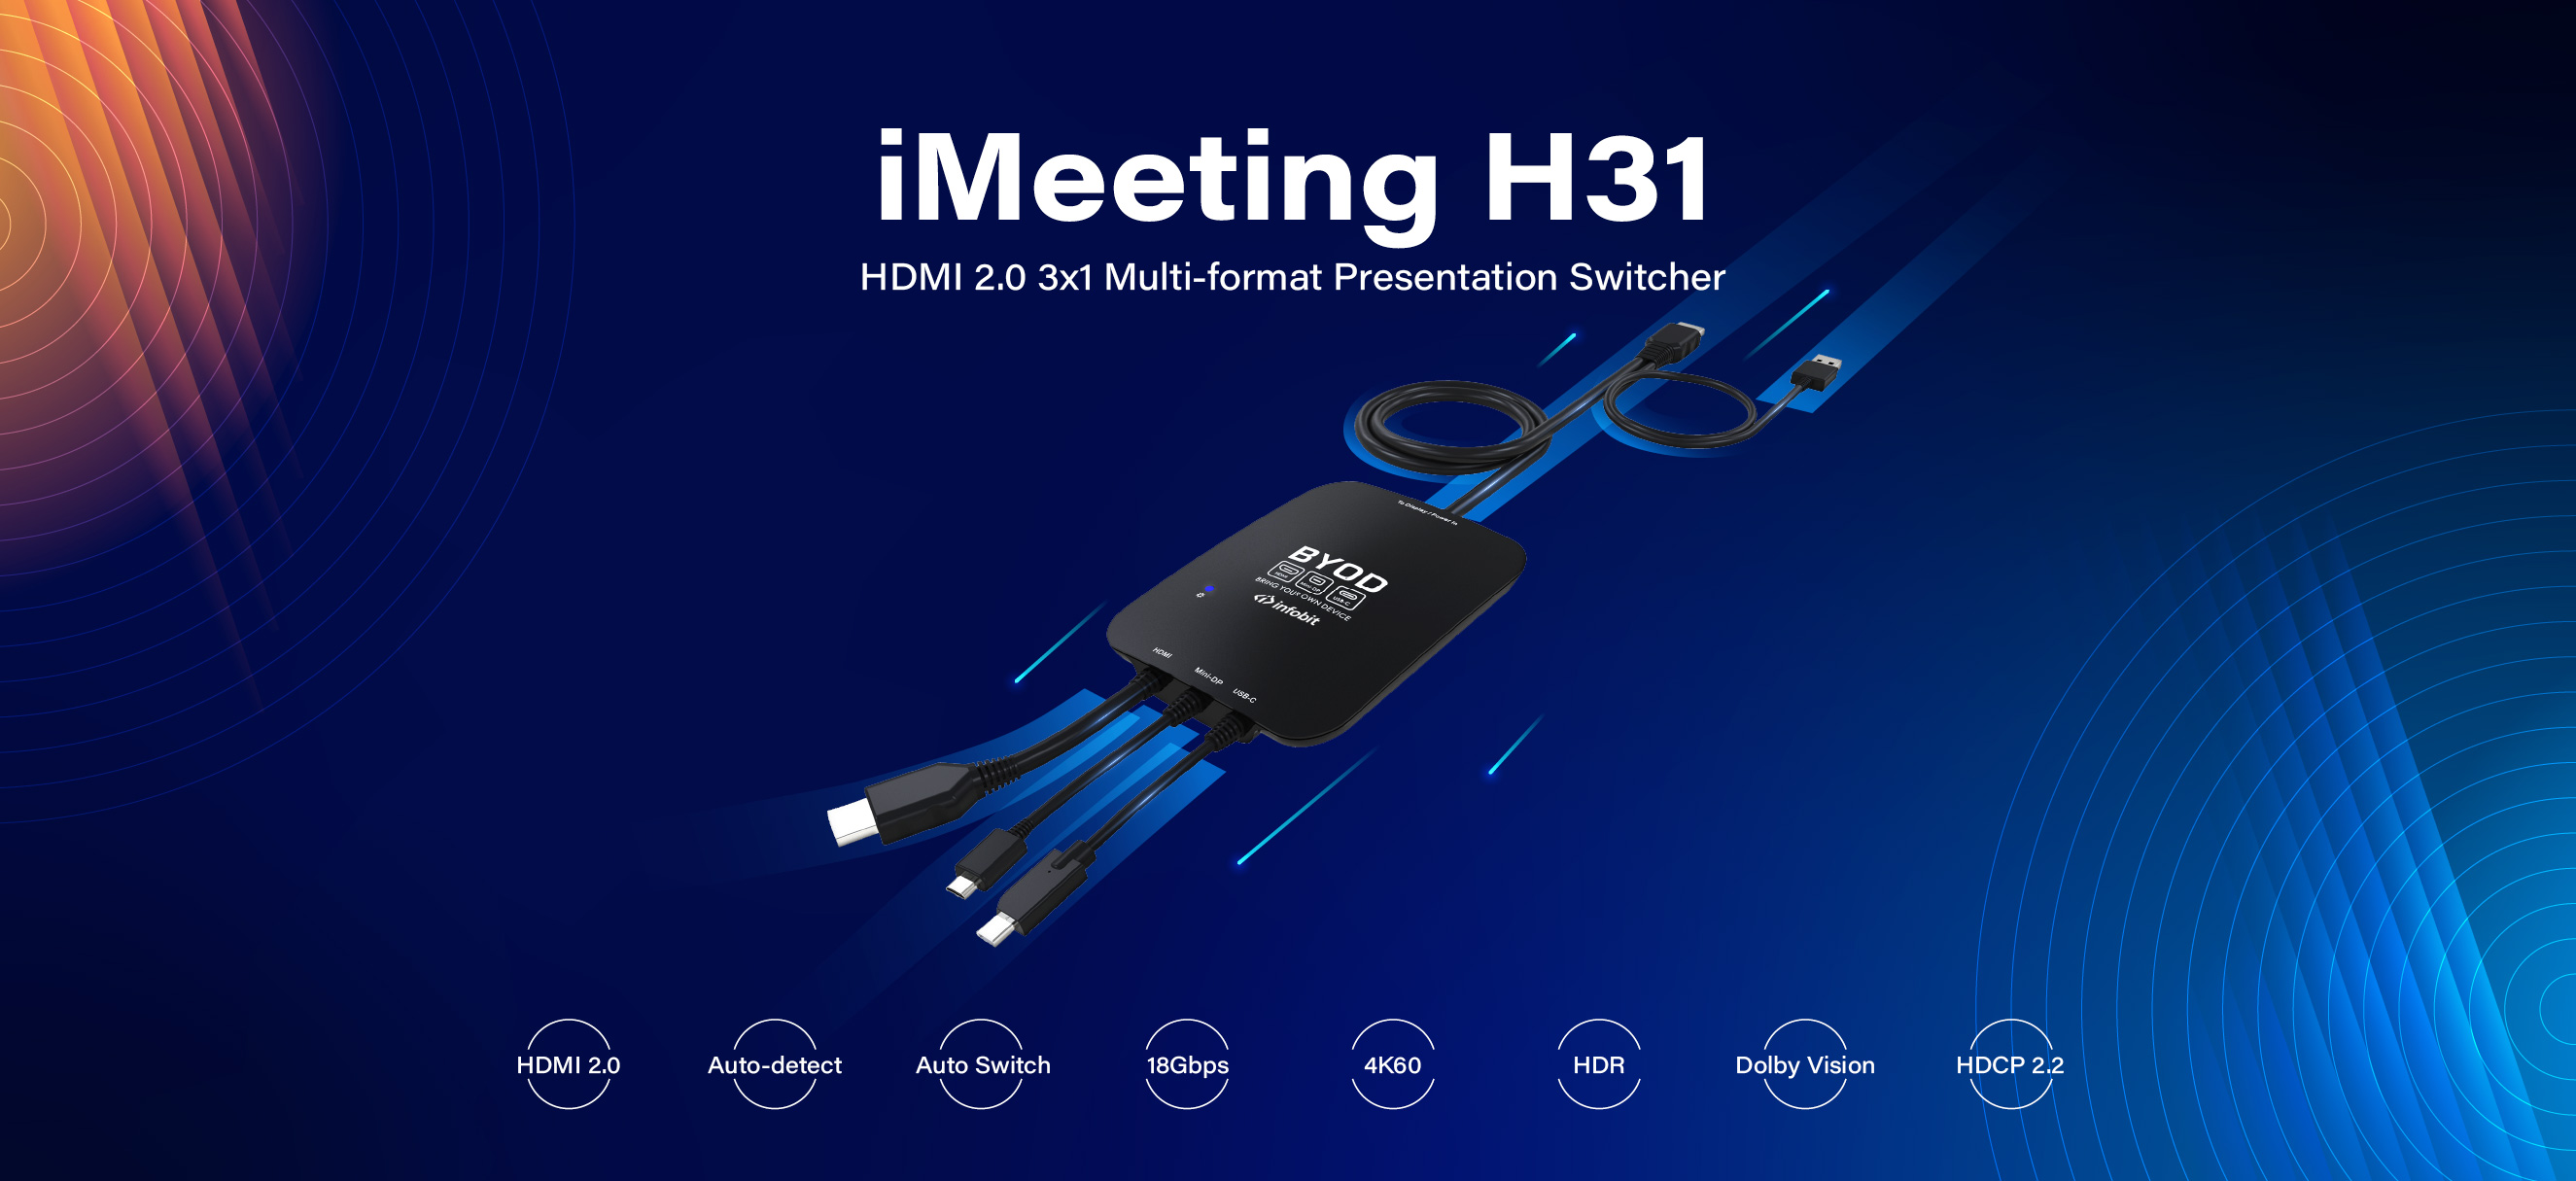 iMeeting H31: HDMI 2.0 3x1 Multi-format Presentation Switcher